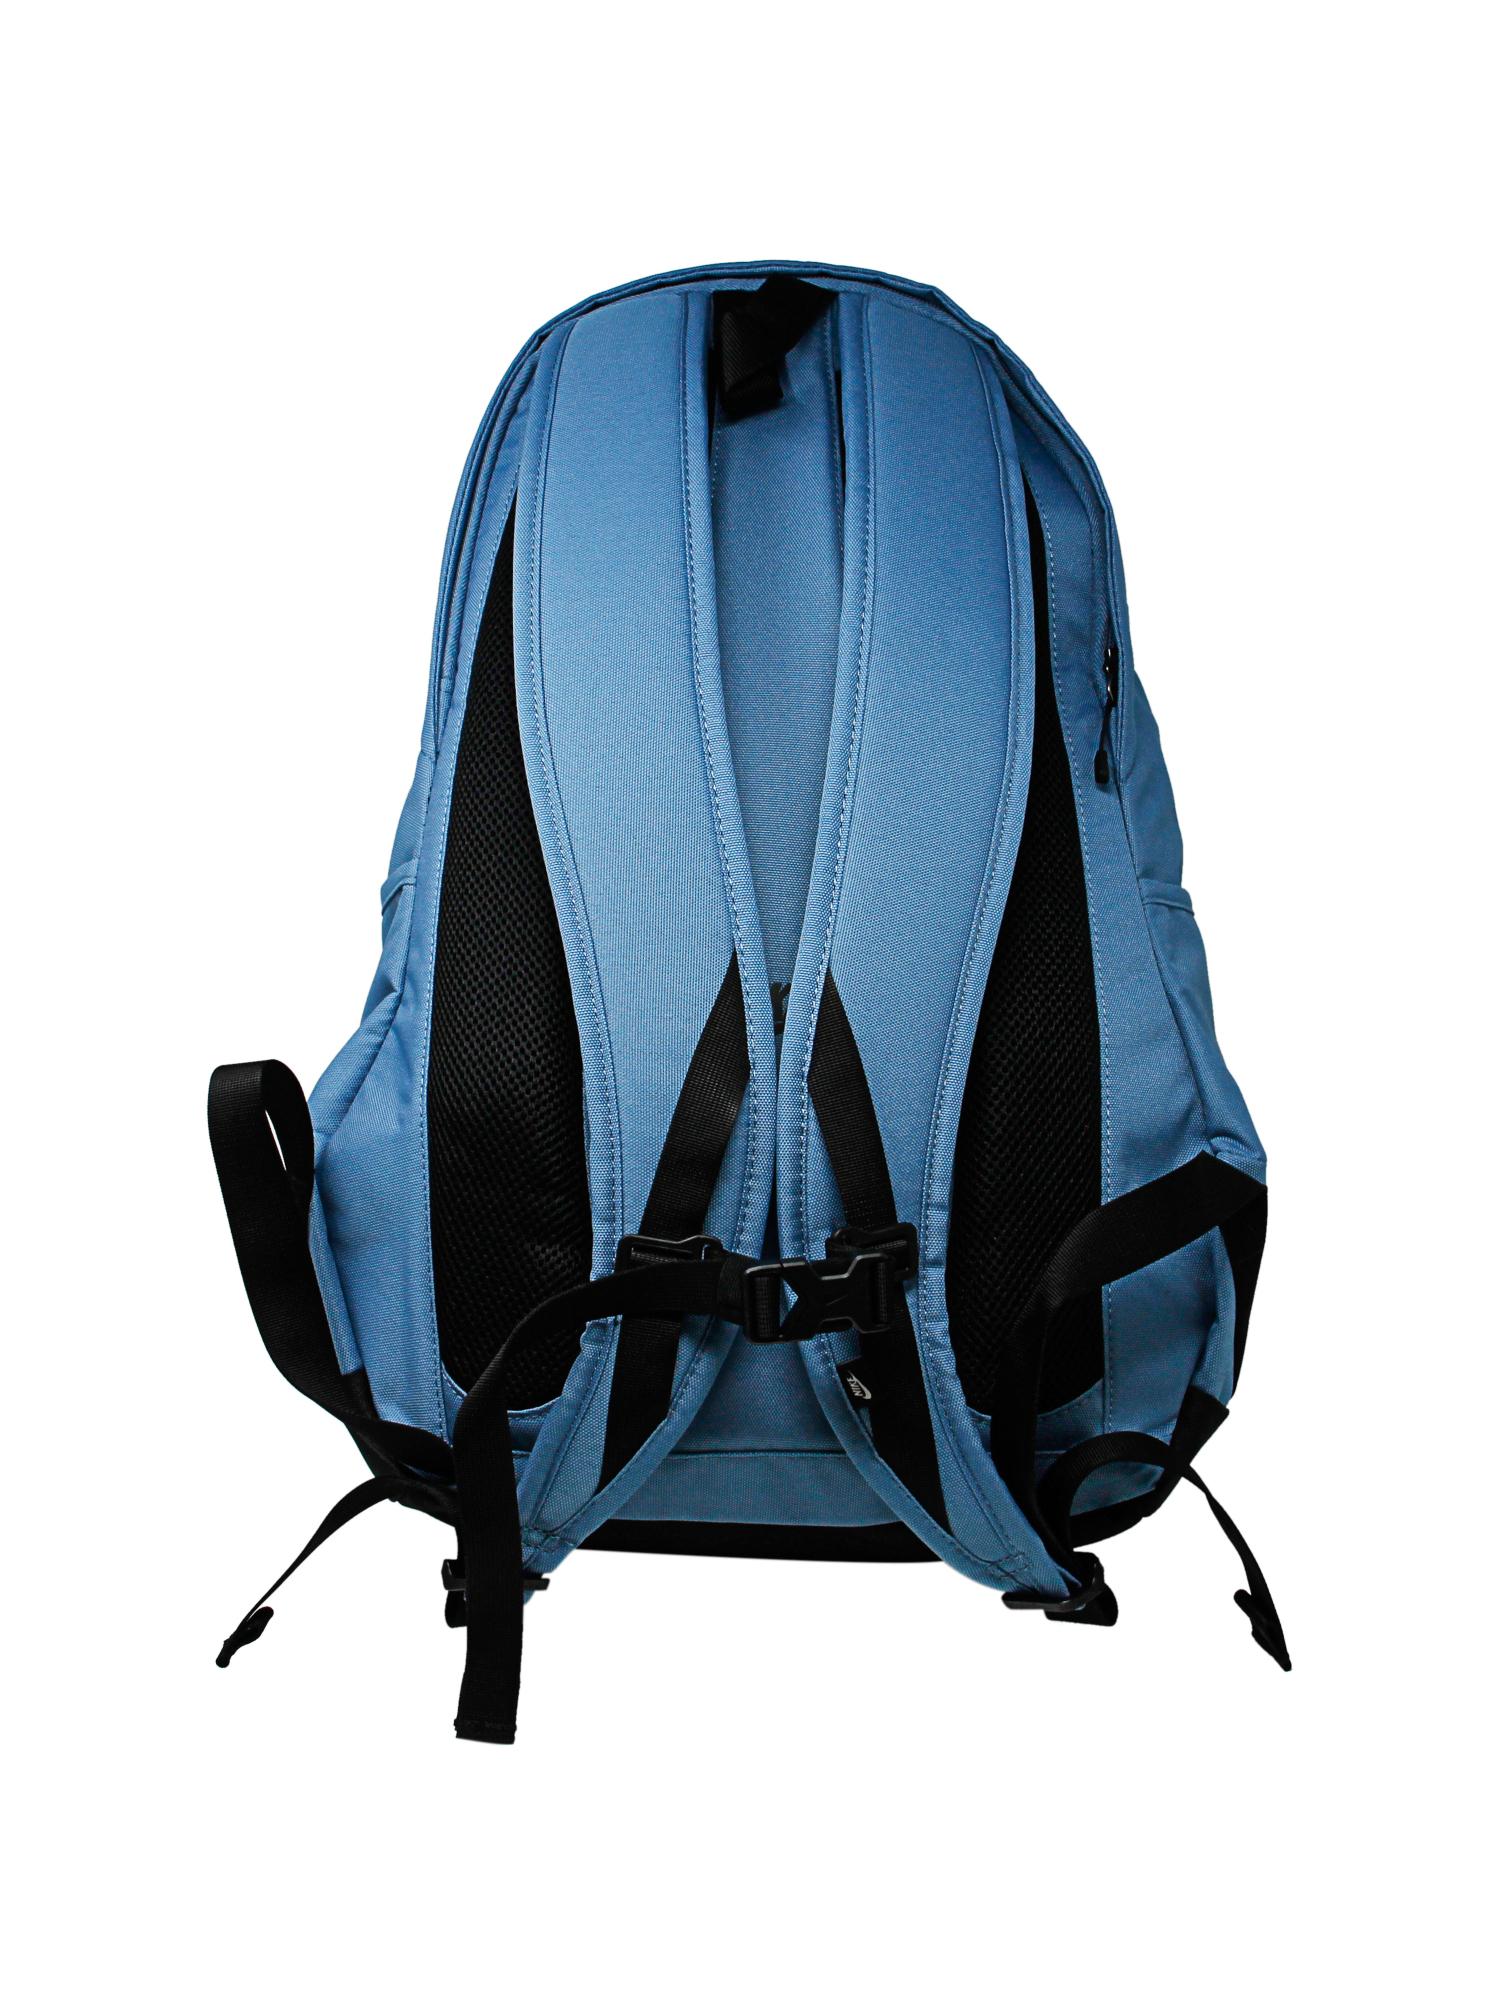 Nike Cheyenne 3.0 Polyester Backpack   eBay 67c335f6c9